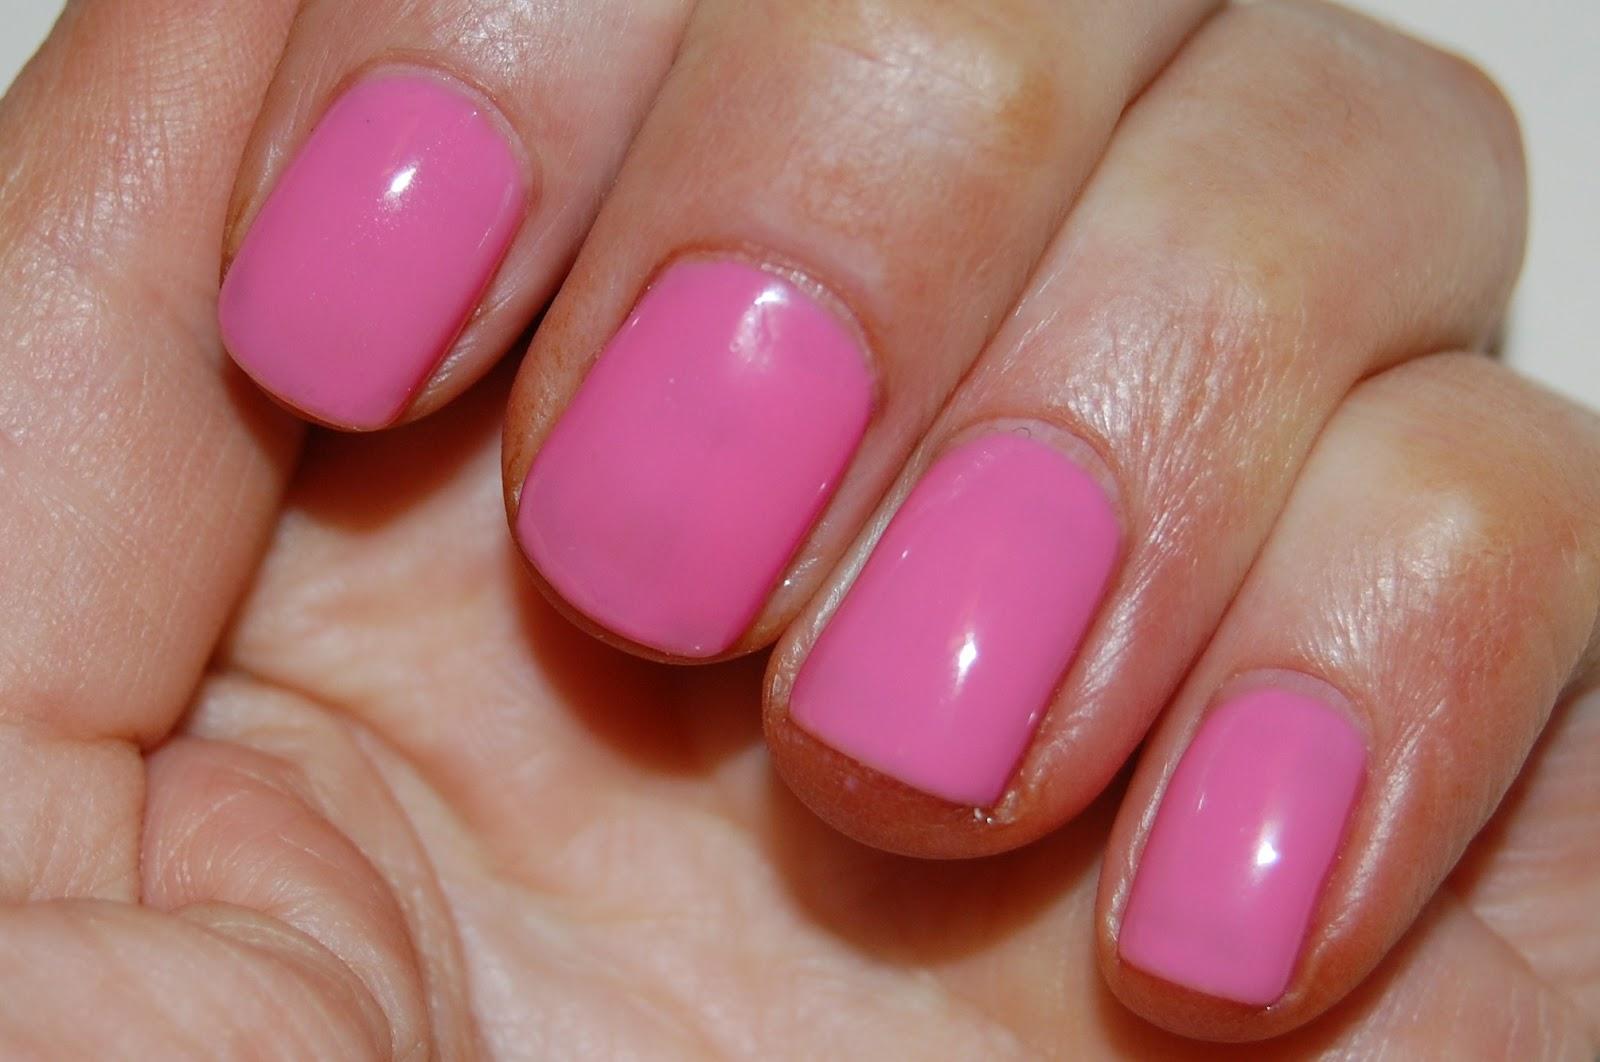 Lipstick Fridays - Beauty Blog: Friday Night Nails Shellac Gotcha